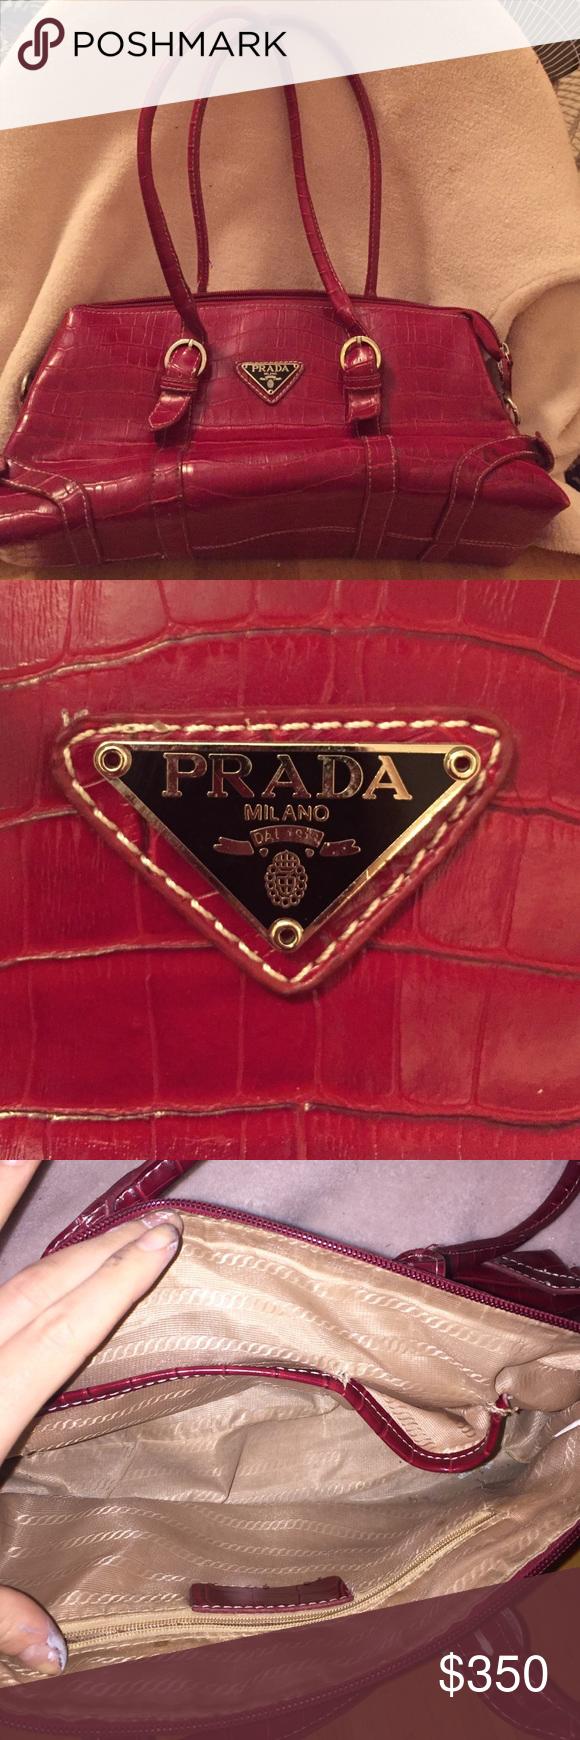 Prada Milano Purse Red Good Condition Bags